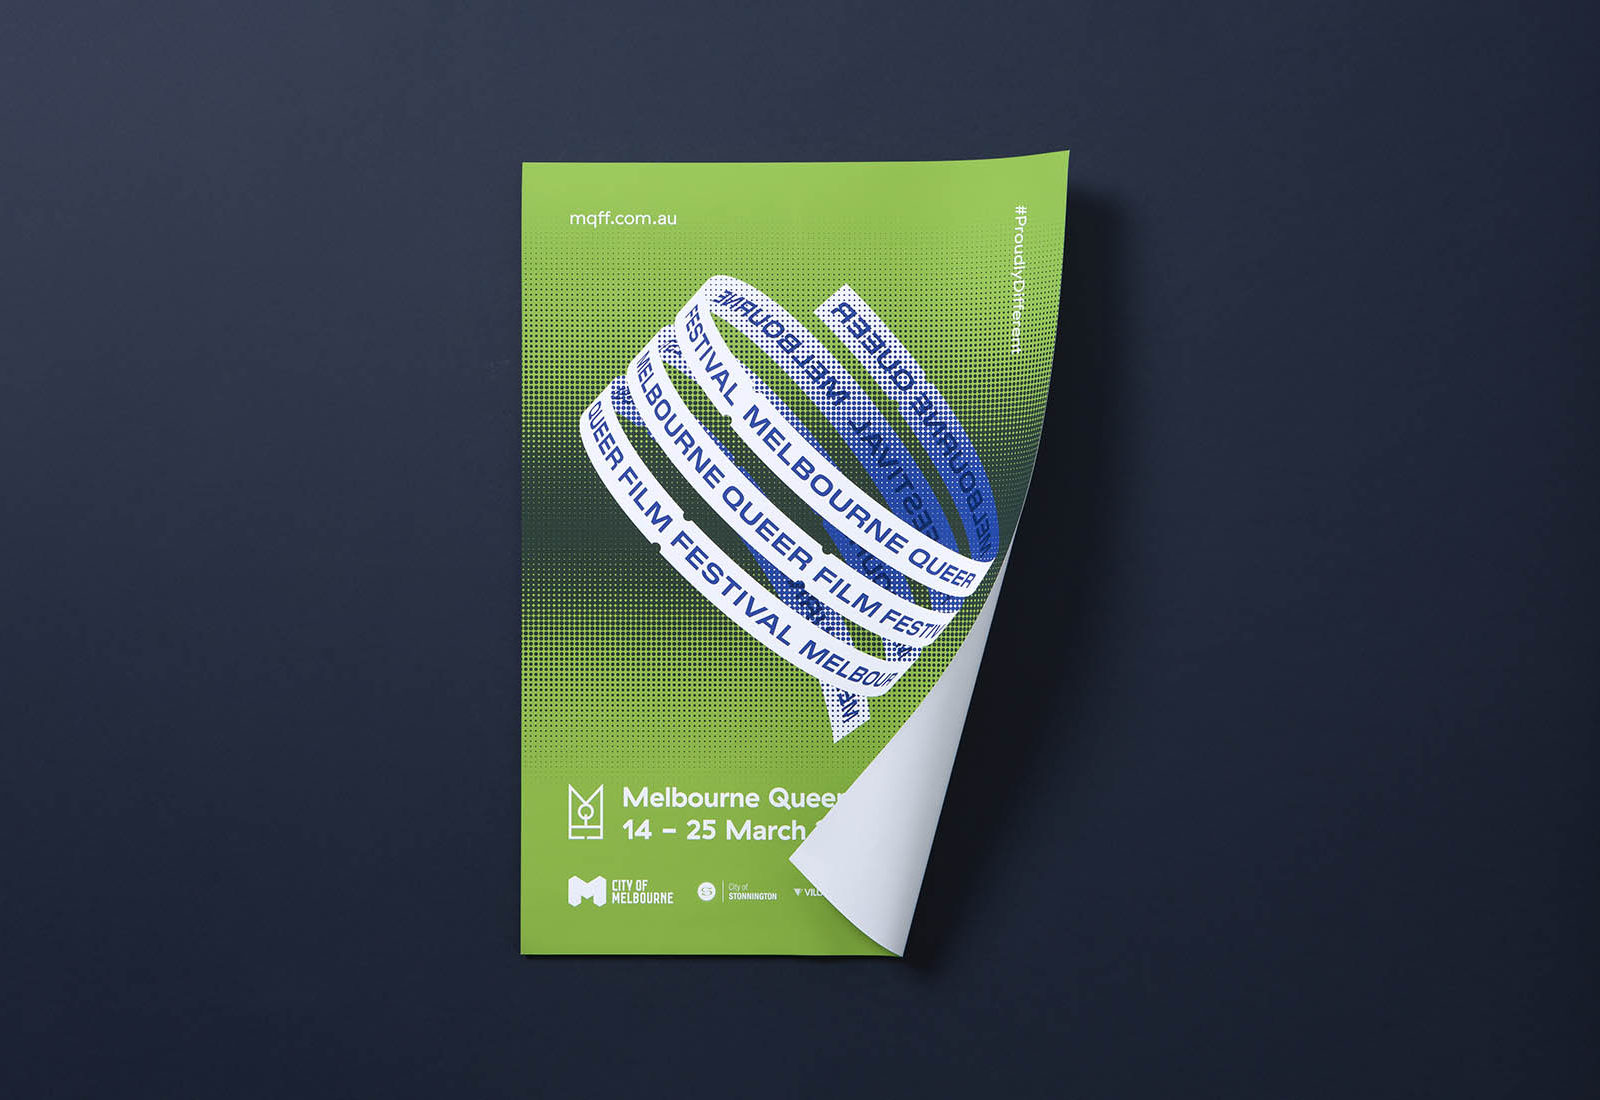 3sidedsquare-melbourne-queer-film-festival-poster-green